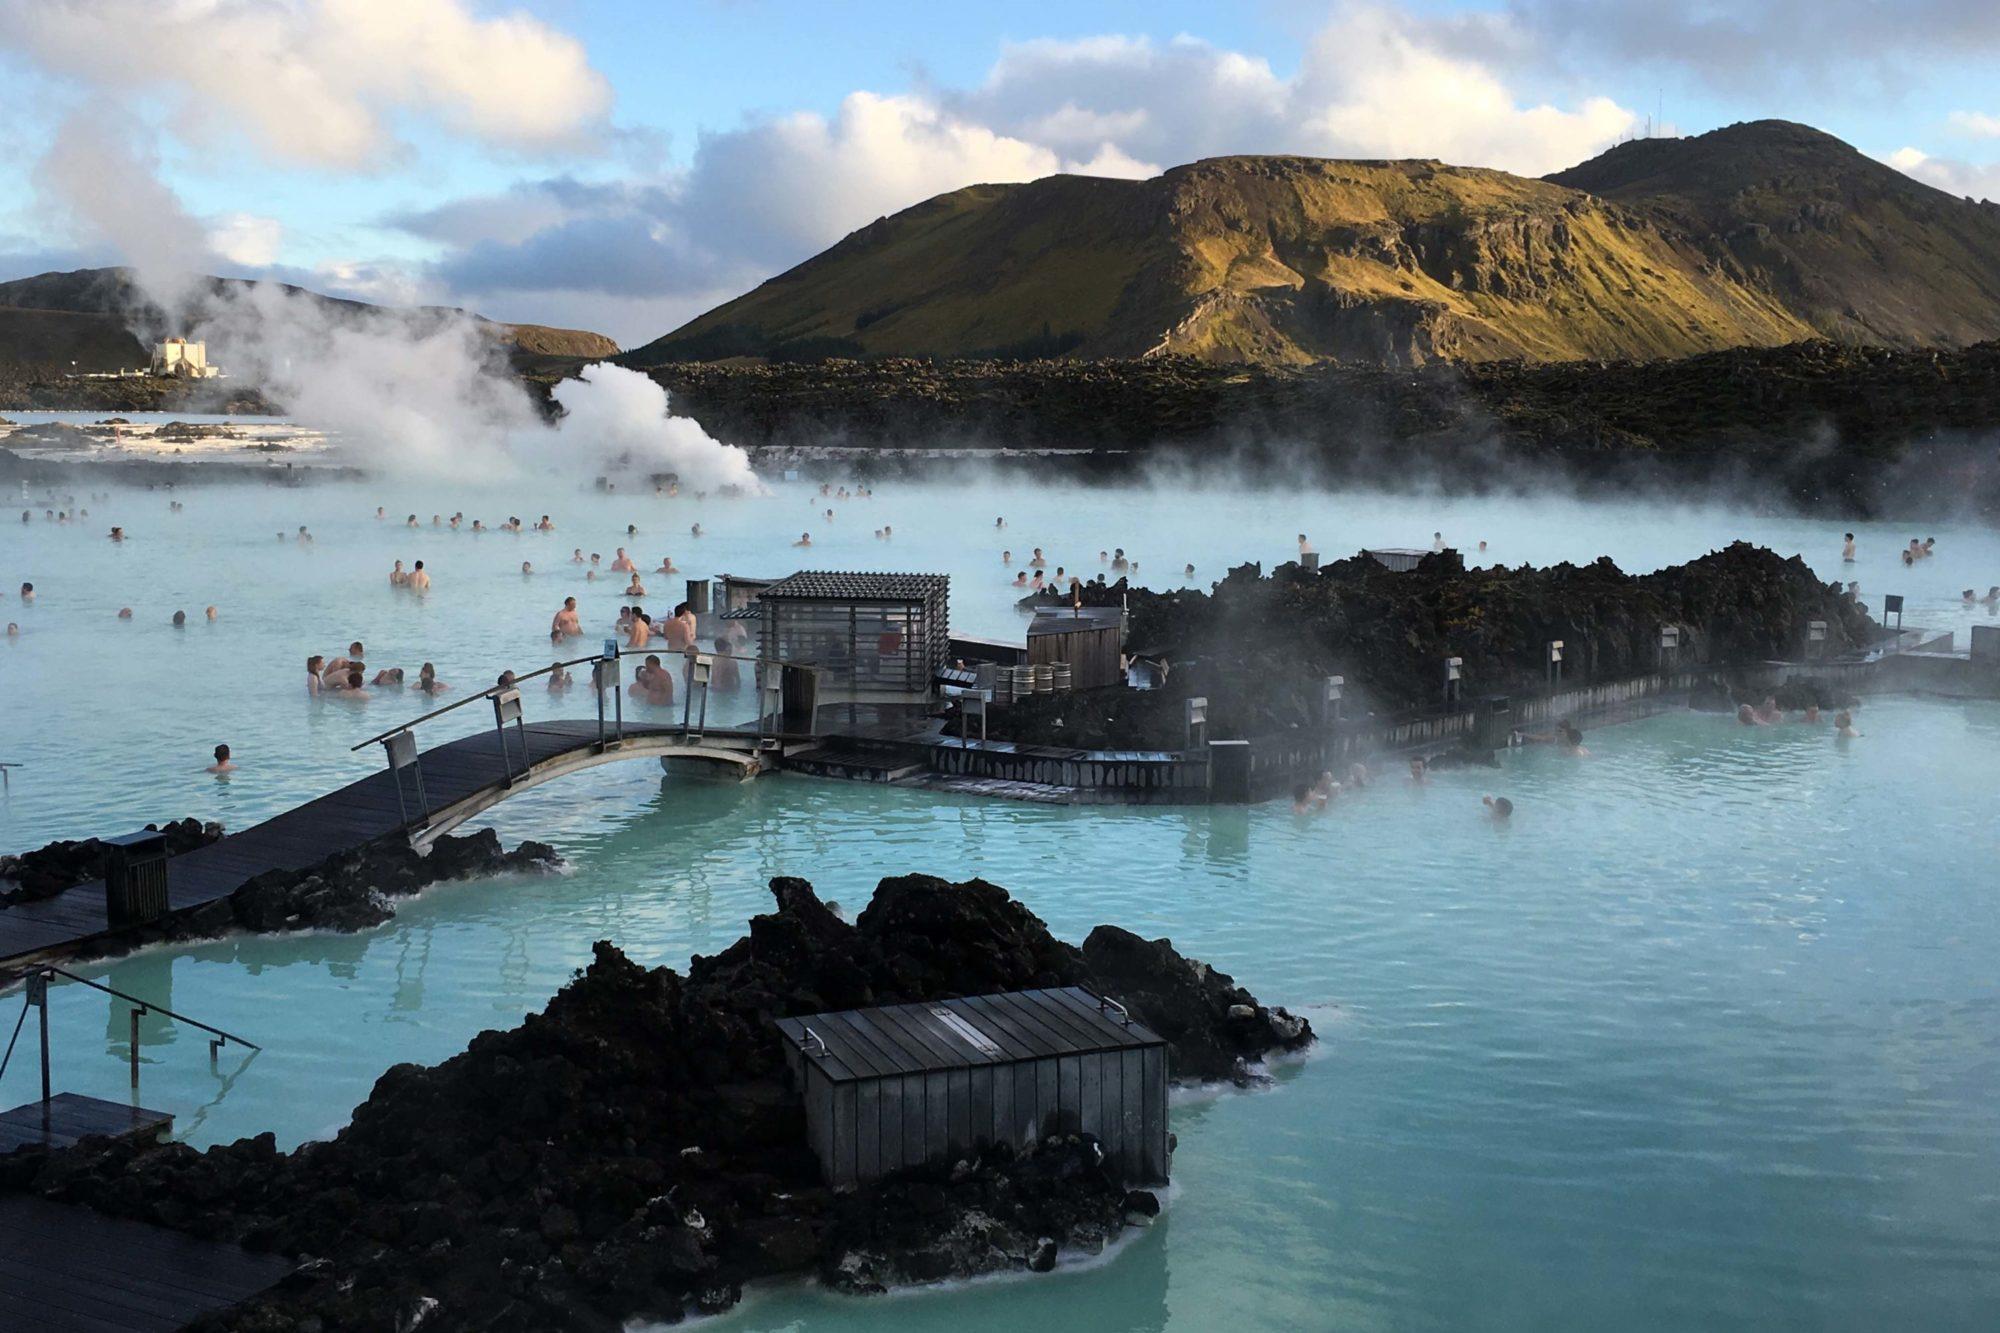 Blue Lagoon Iceland 22360145156 e1535709076739 ICELAND ROAD TRIP